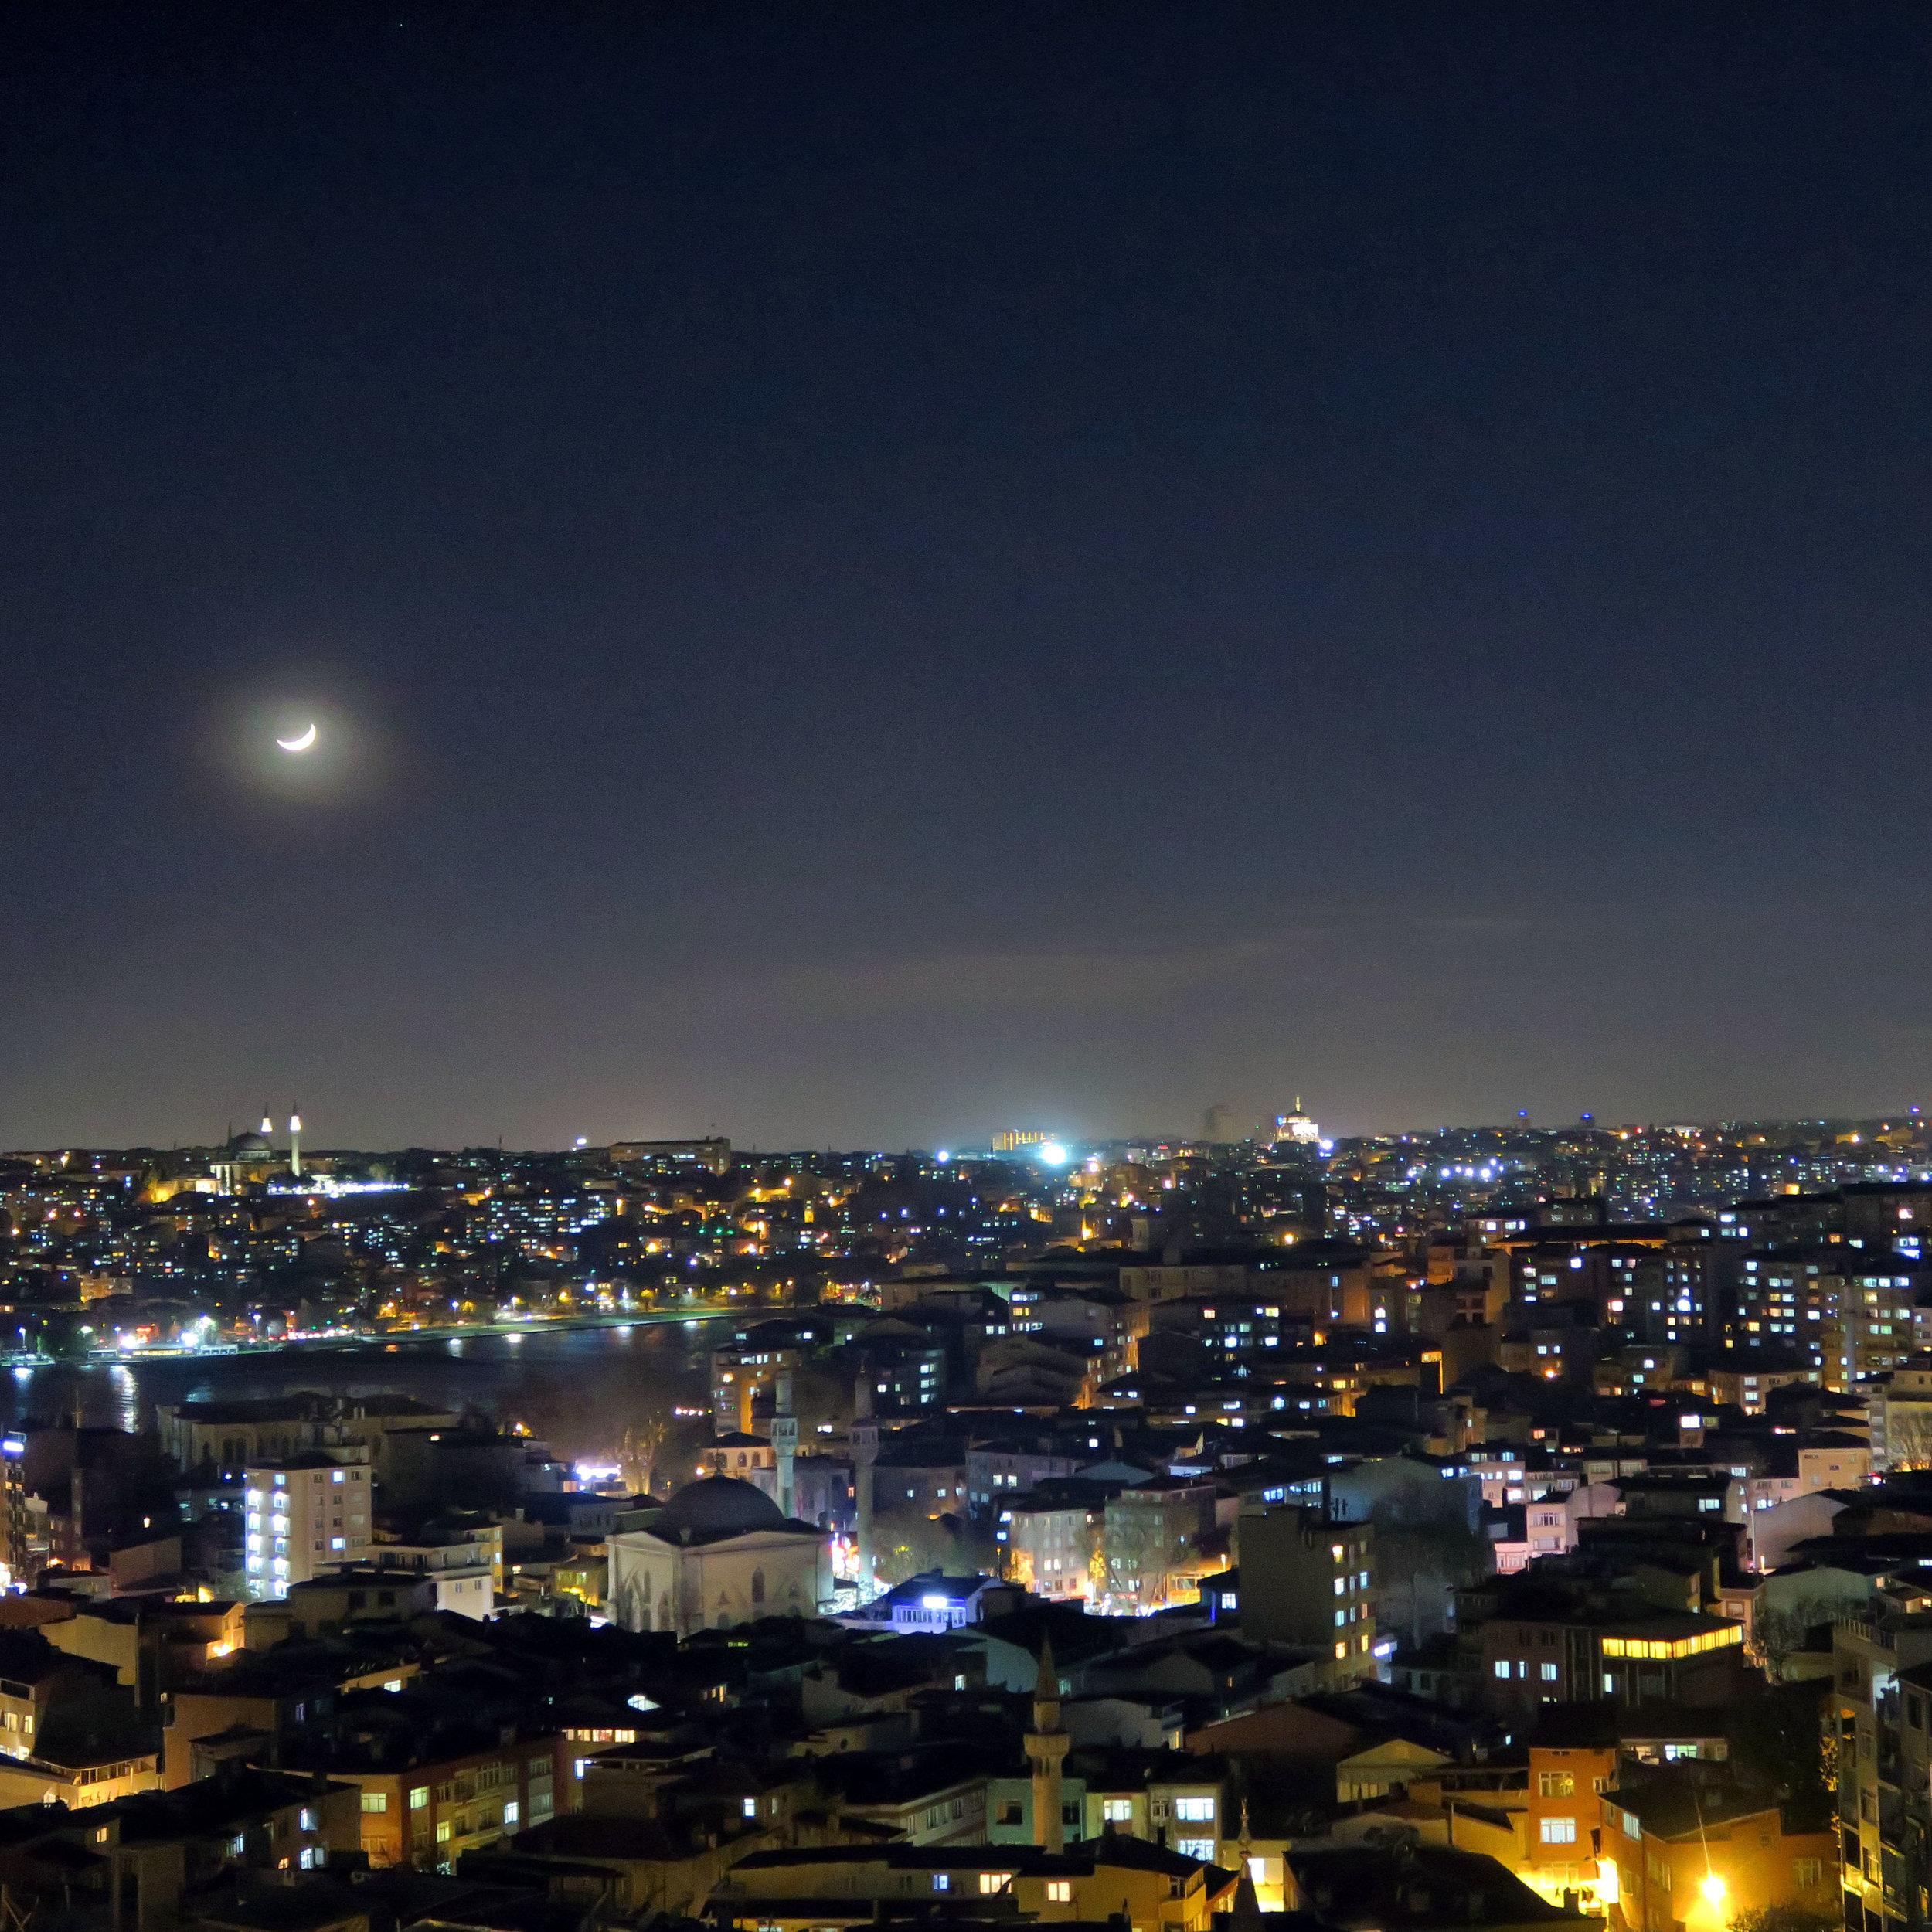 IstanbulNightSky.jpg